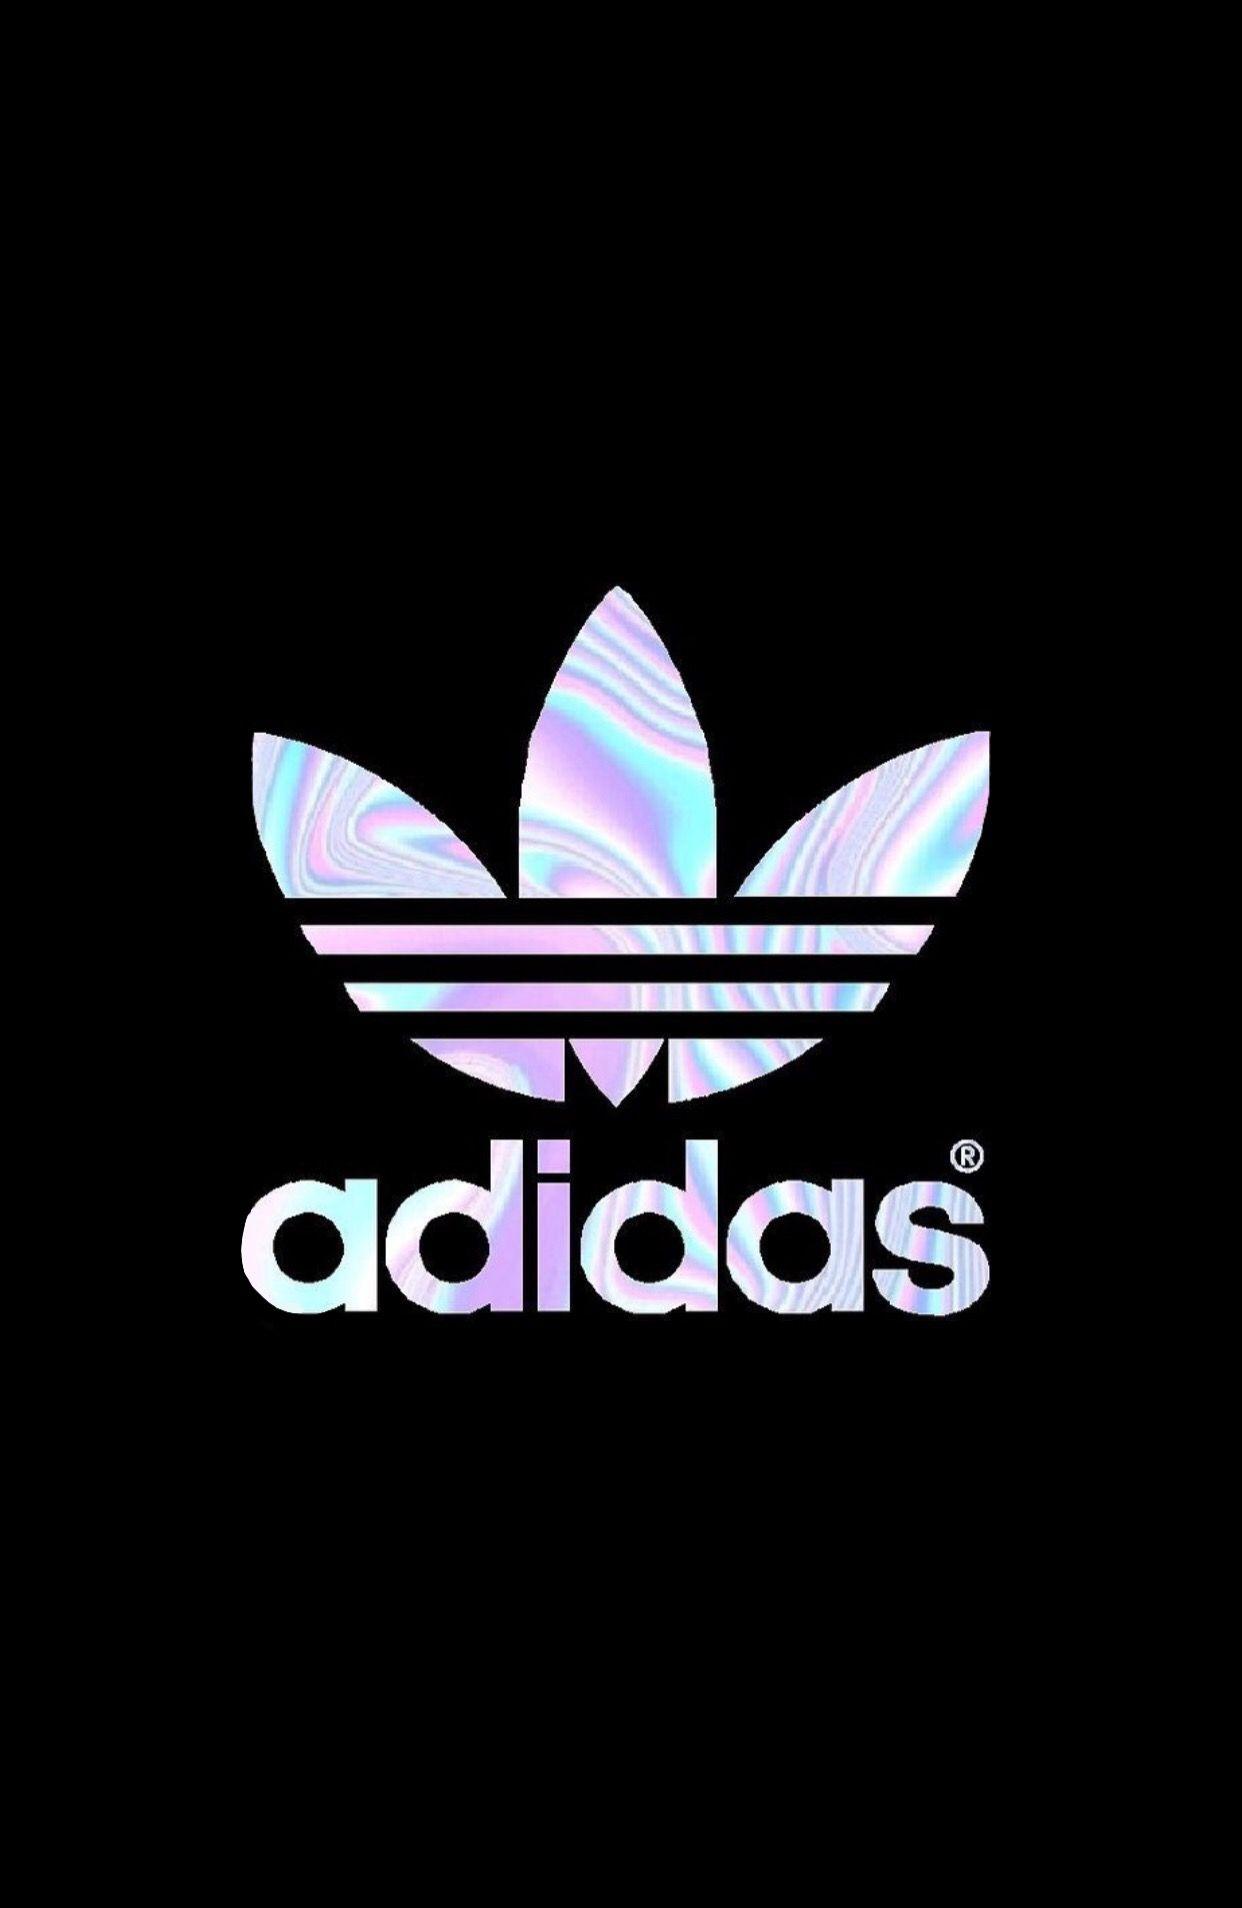 holo adidas | Texts | Nike wallpaper, Adidas backgrounds ...